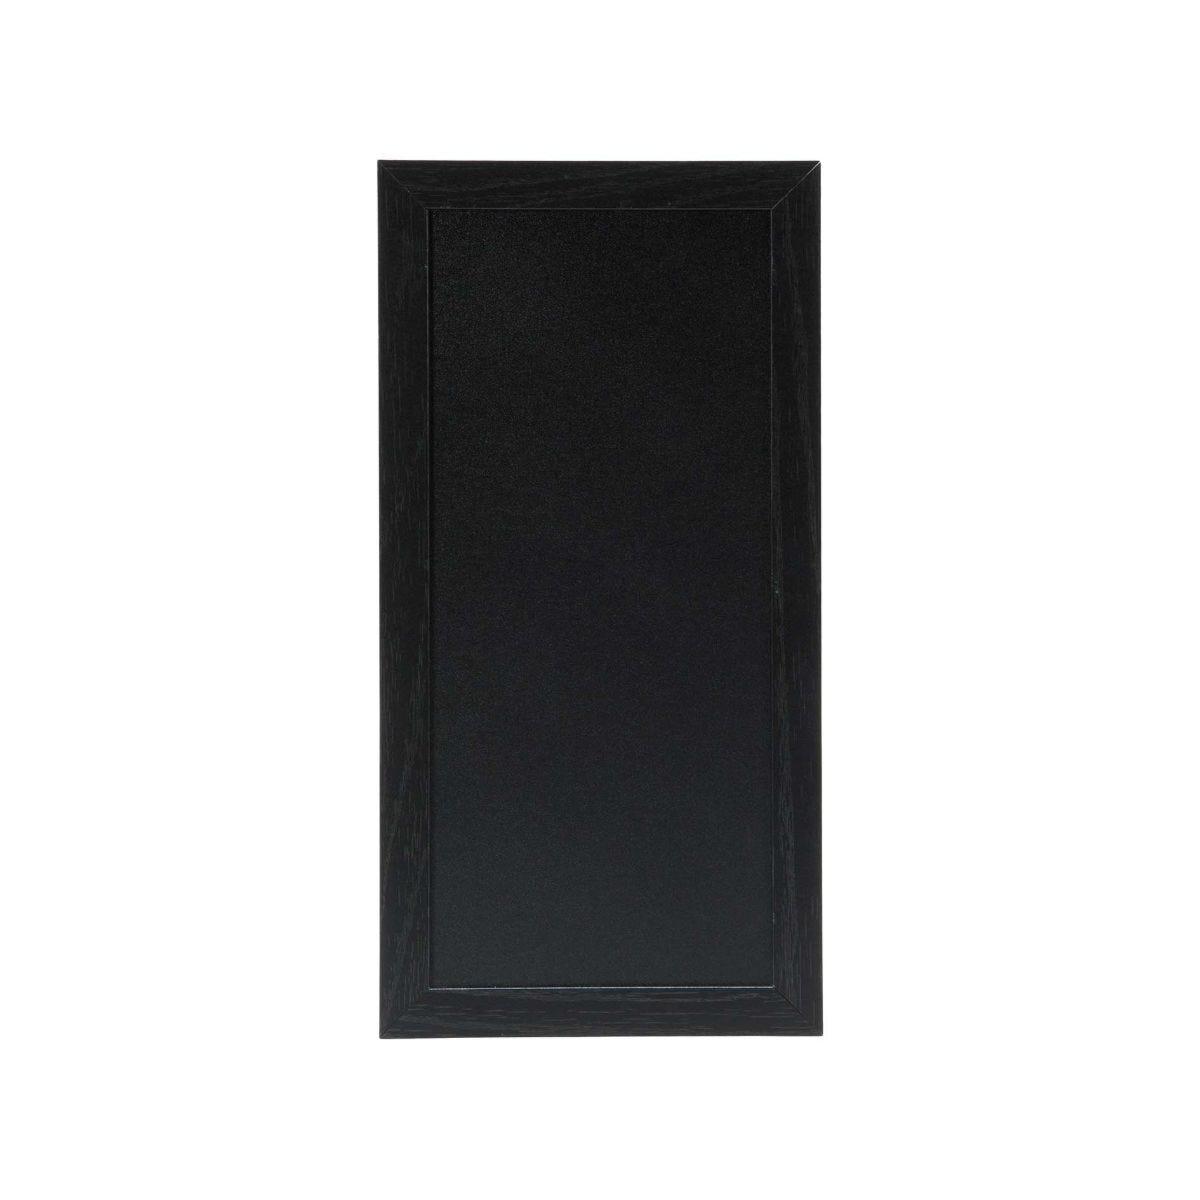 Securit Chalk Board with Black Frame - 20 x 40cm Black